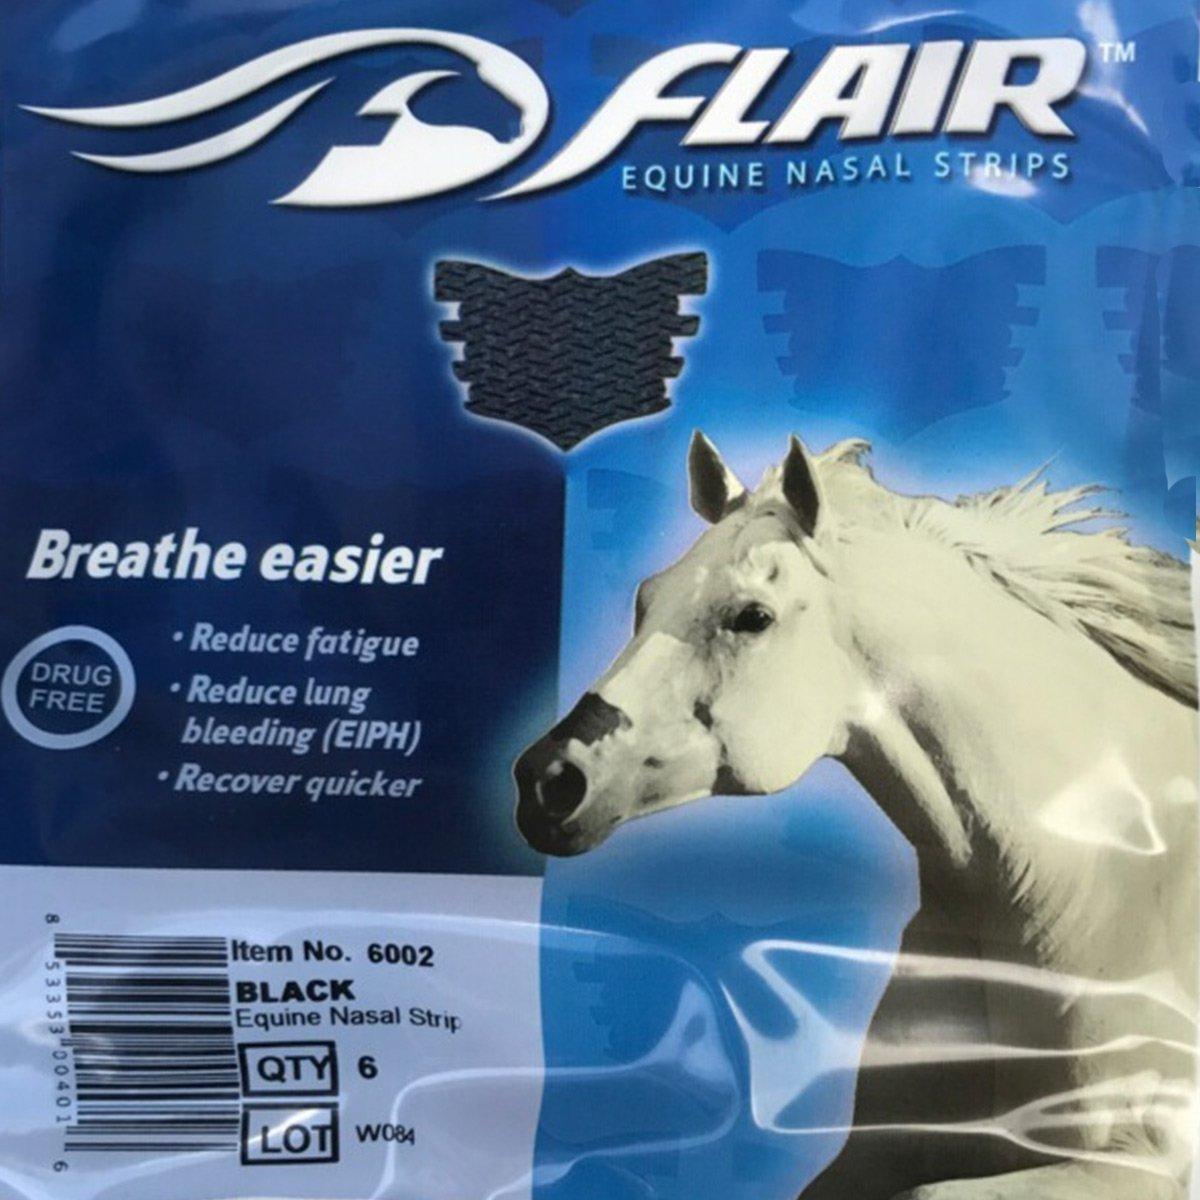 Flair Equine Nasal Strips Equine Nasal Strip Value Pack